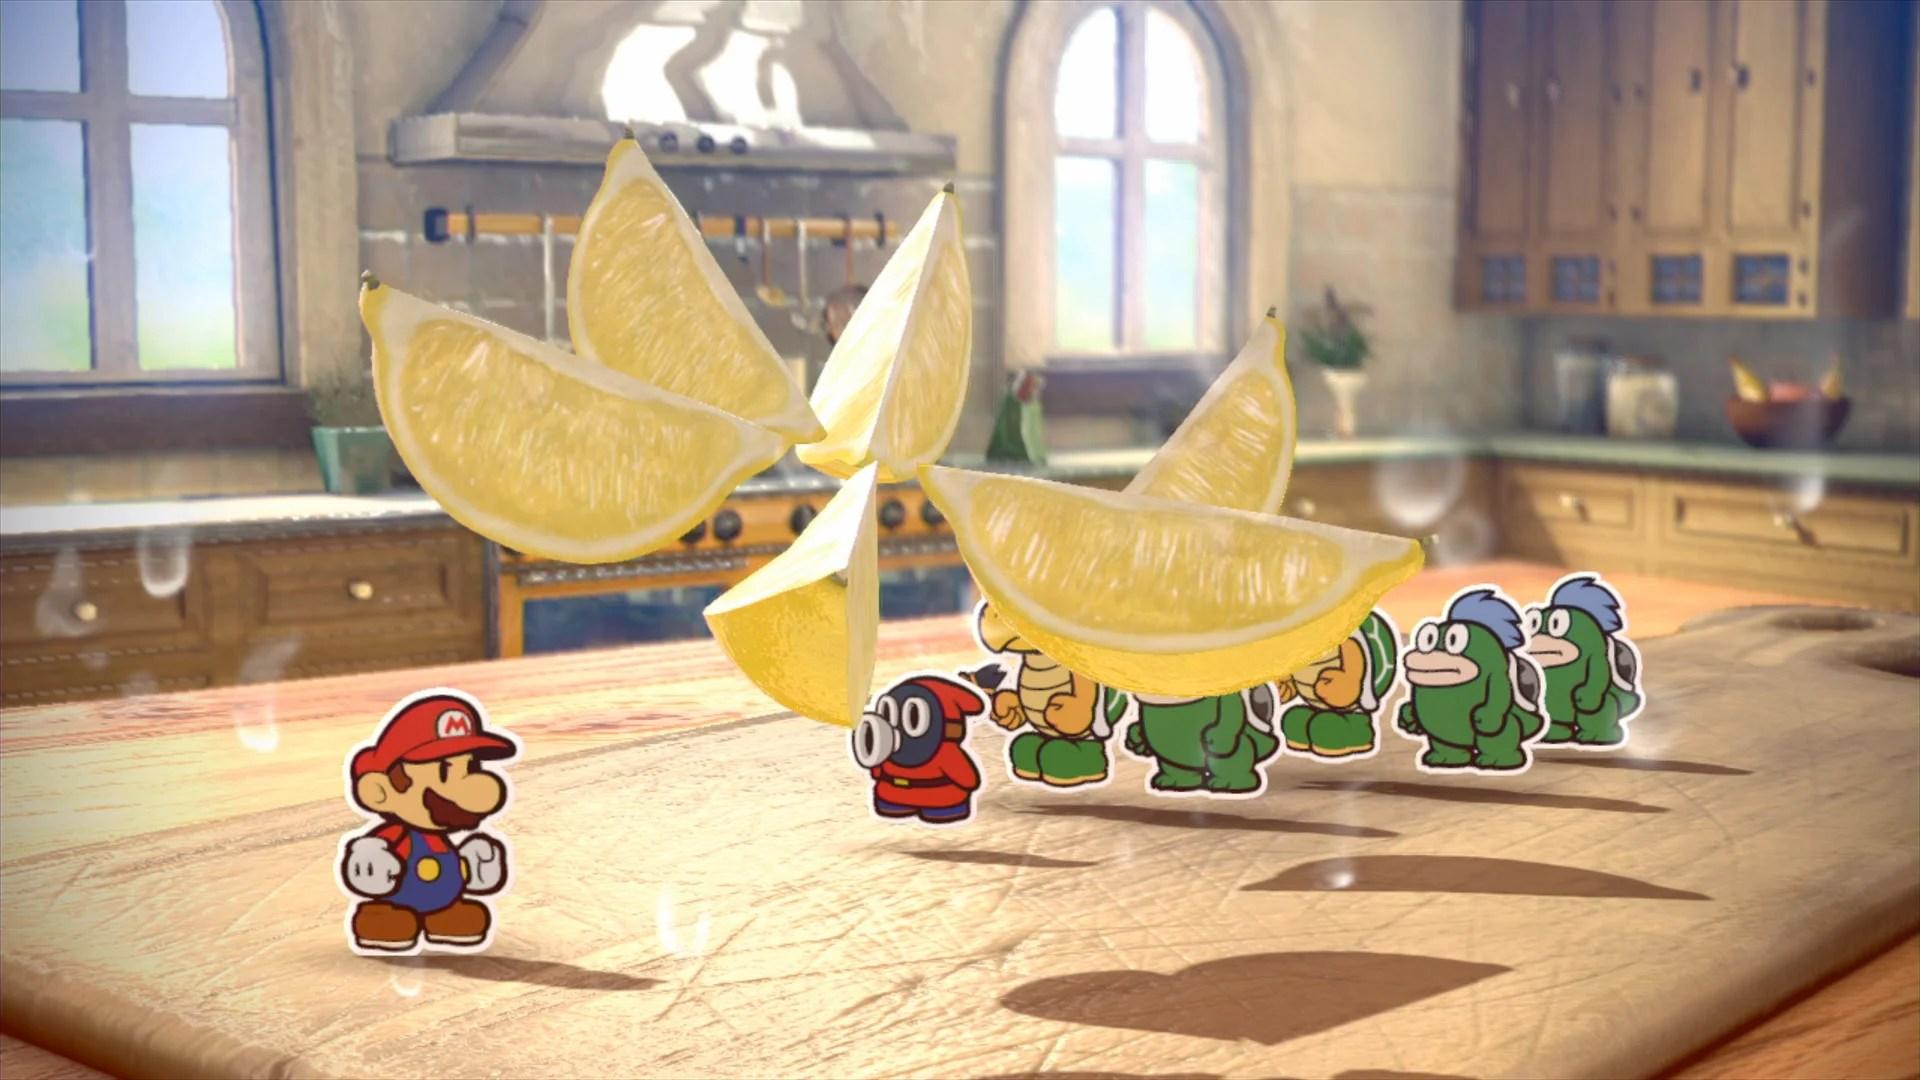 Paper Mario Color Splash Has The Most Realistic Looking Lemons